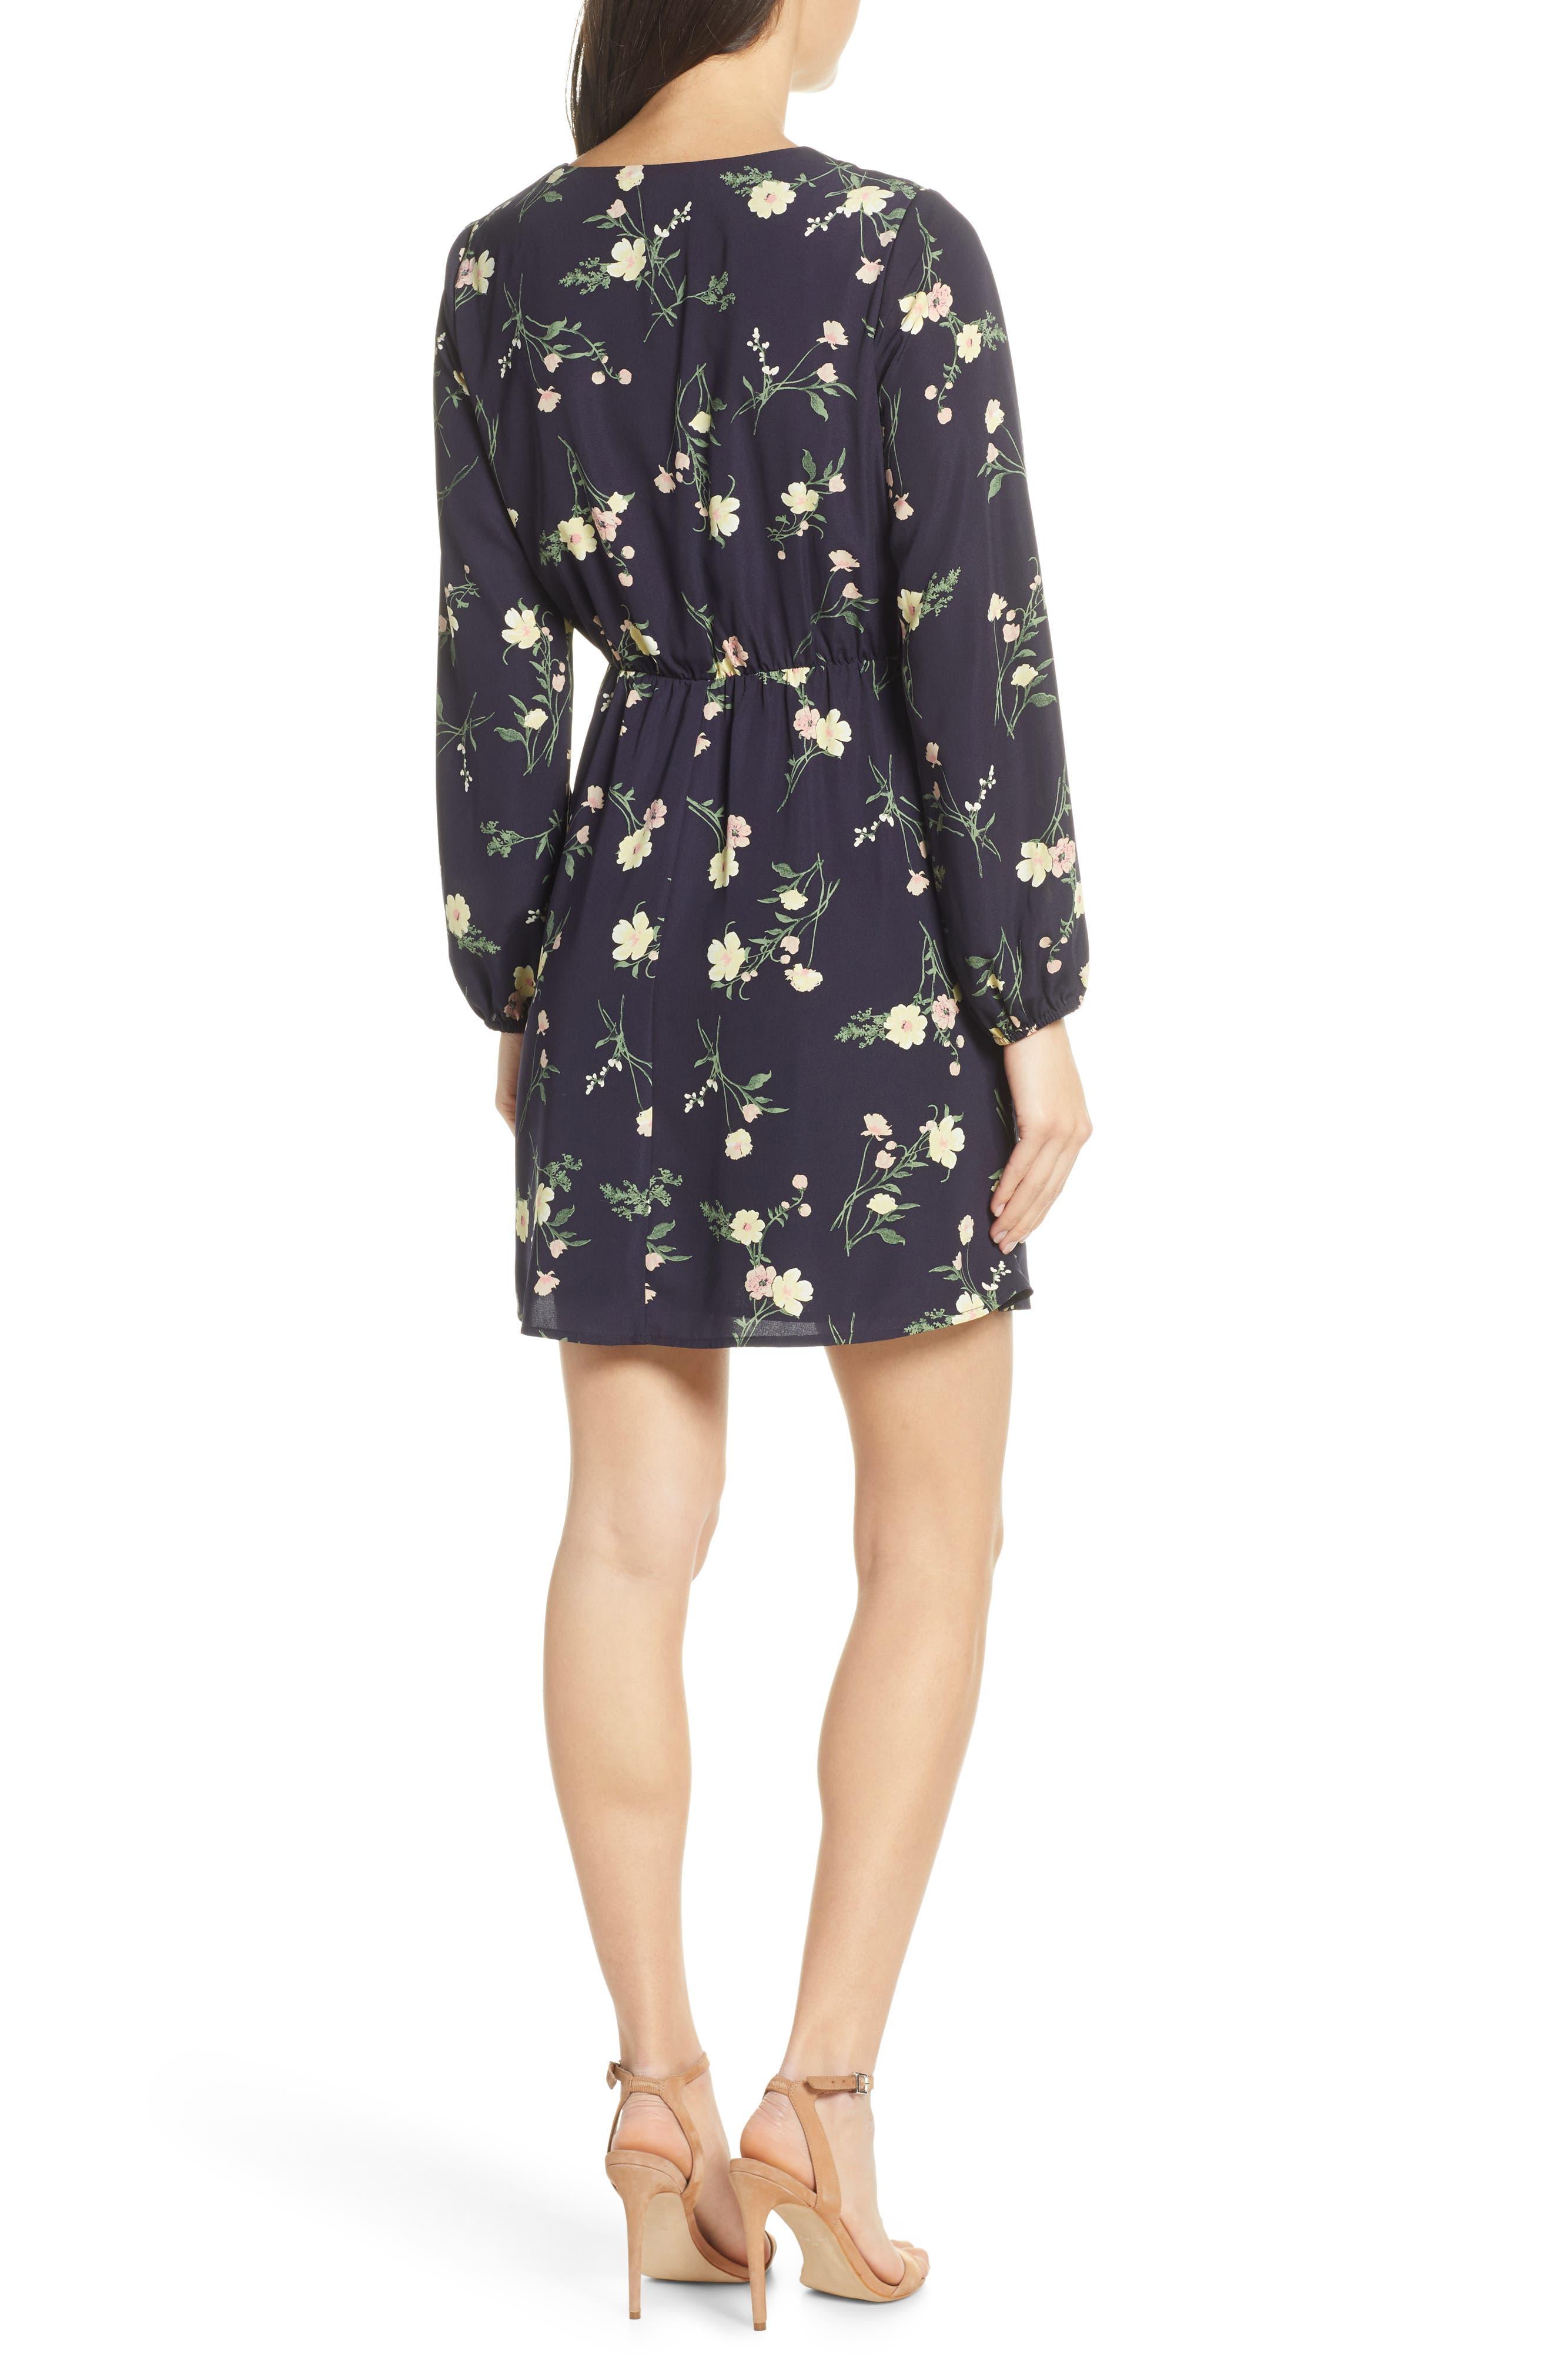 19 COOPER, Long Sleeve Floral Dress, Alternate thumbnail 2, color, NAVY FLORAL